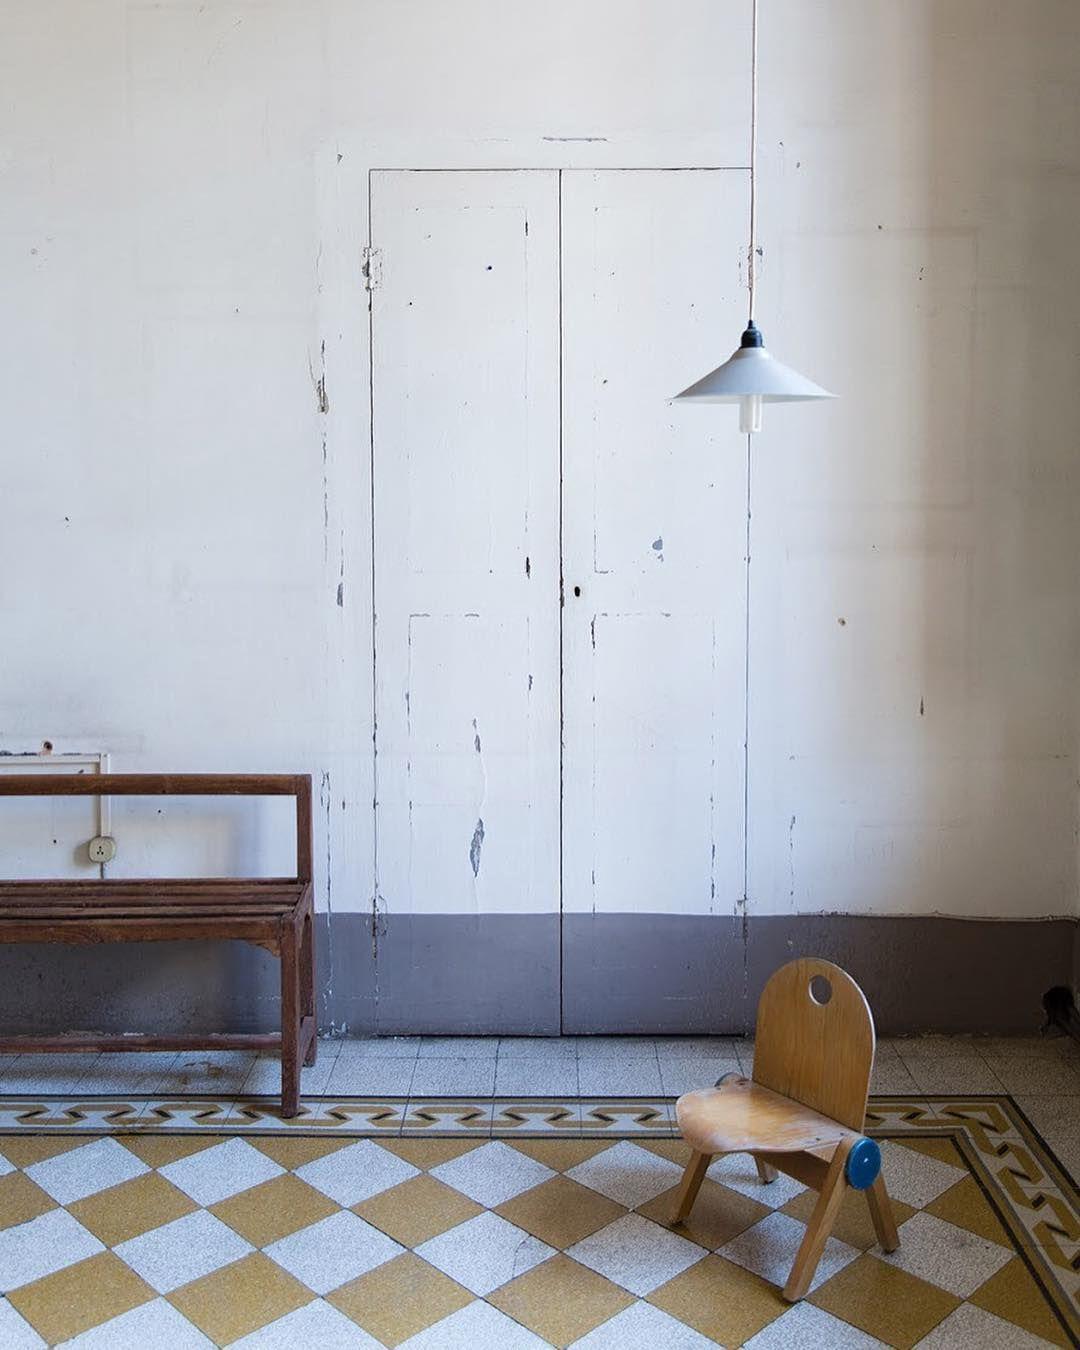 Laminate Flooring Accent Wall Random Arrangement: OPENHOUSE 'the Life We Share